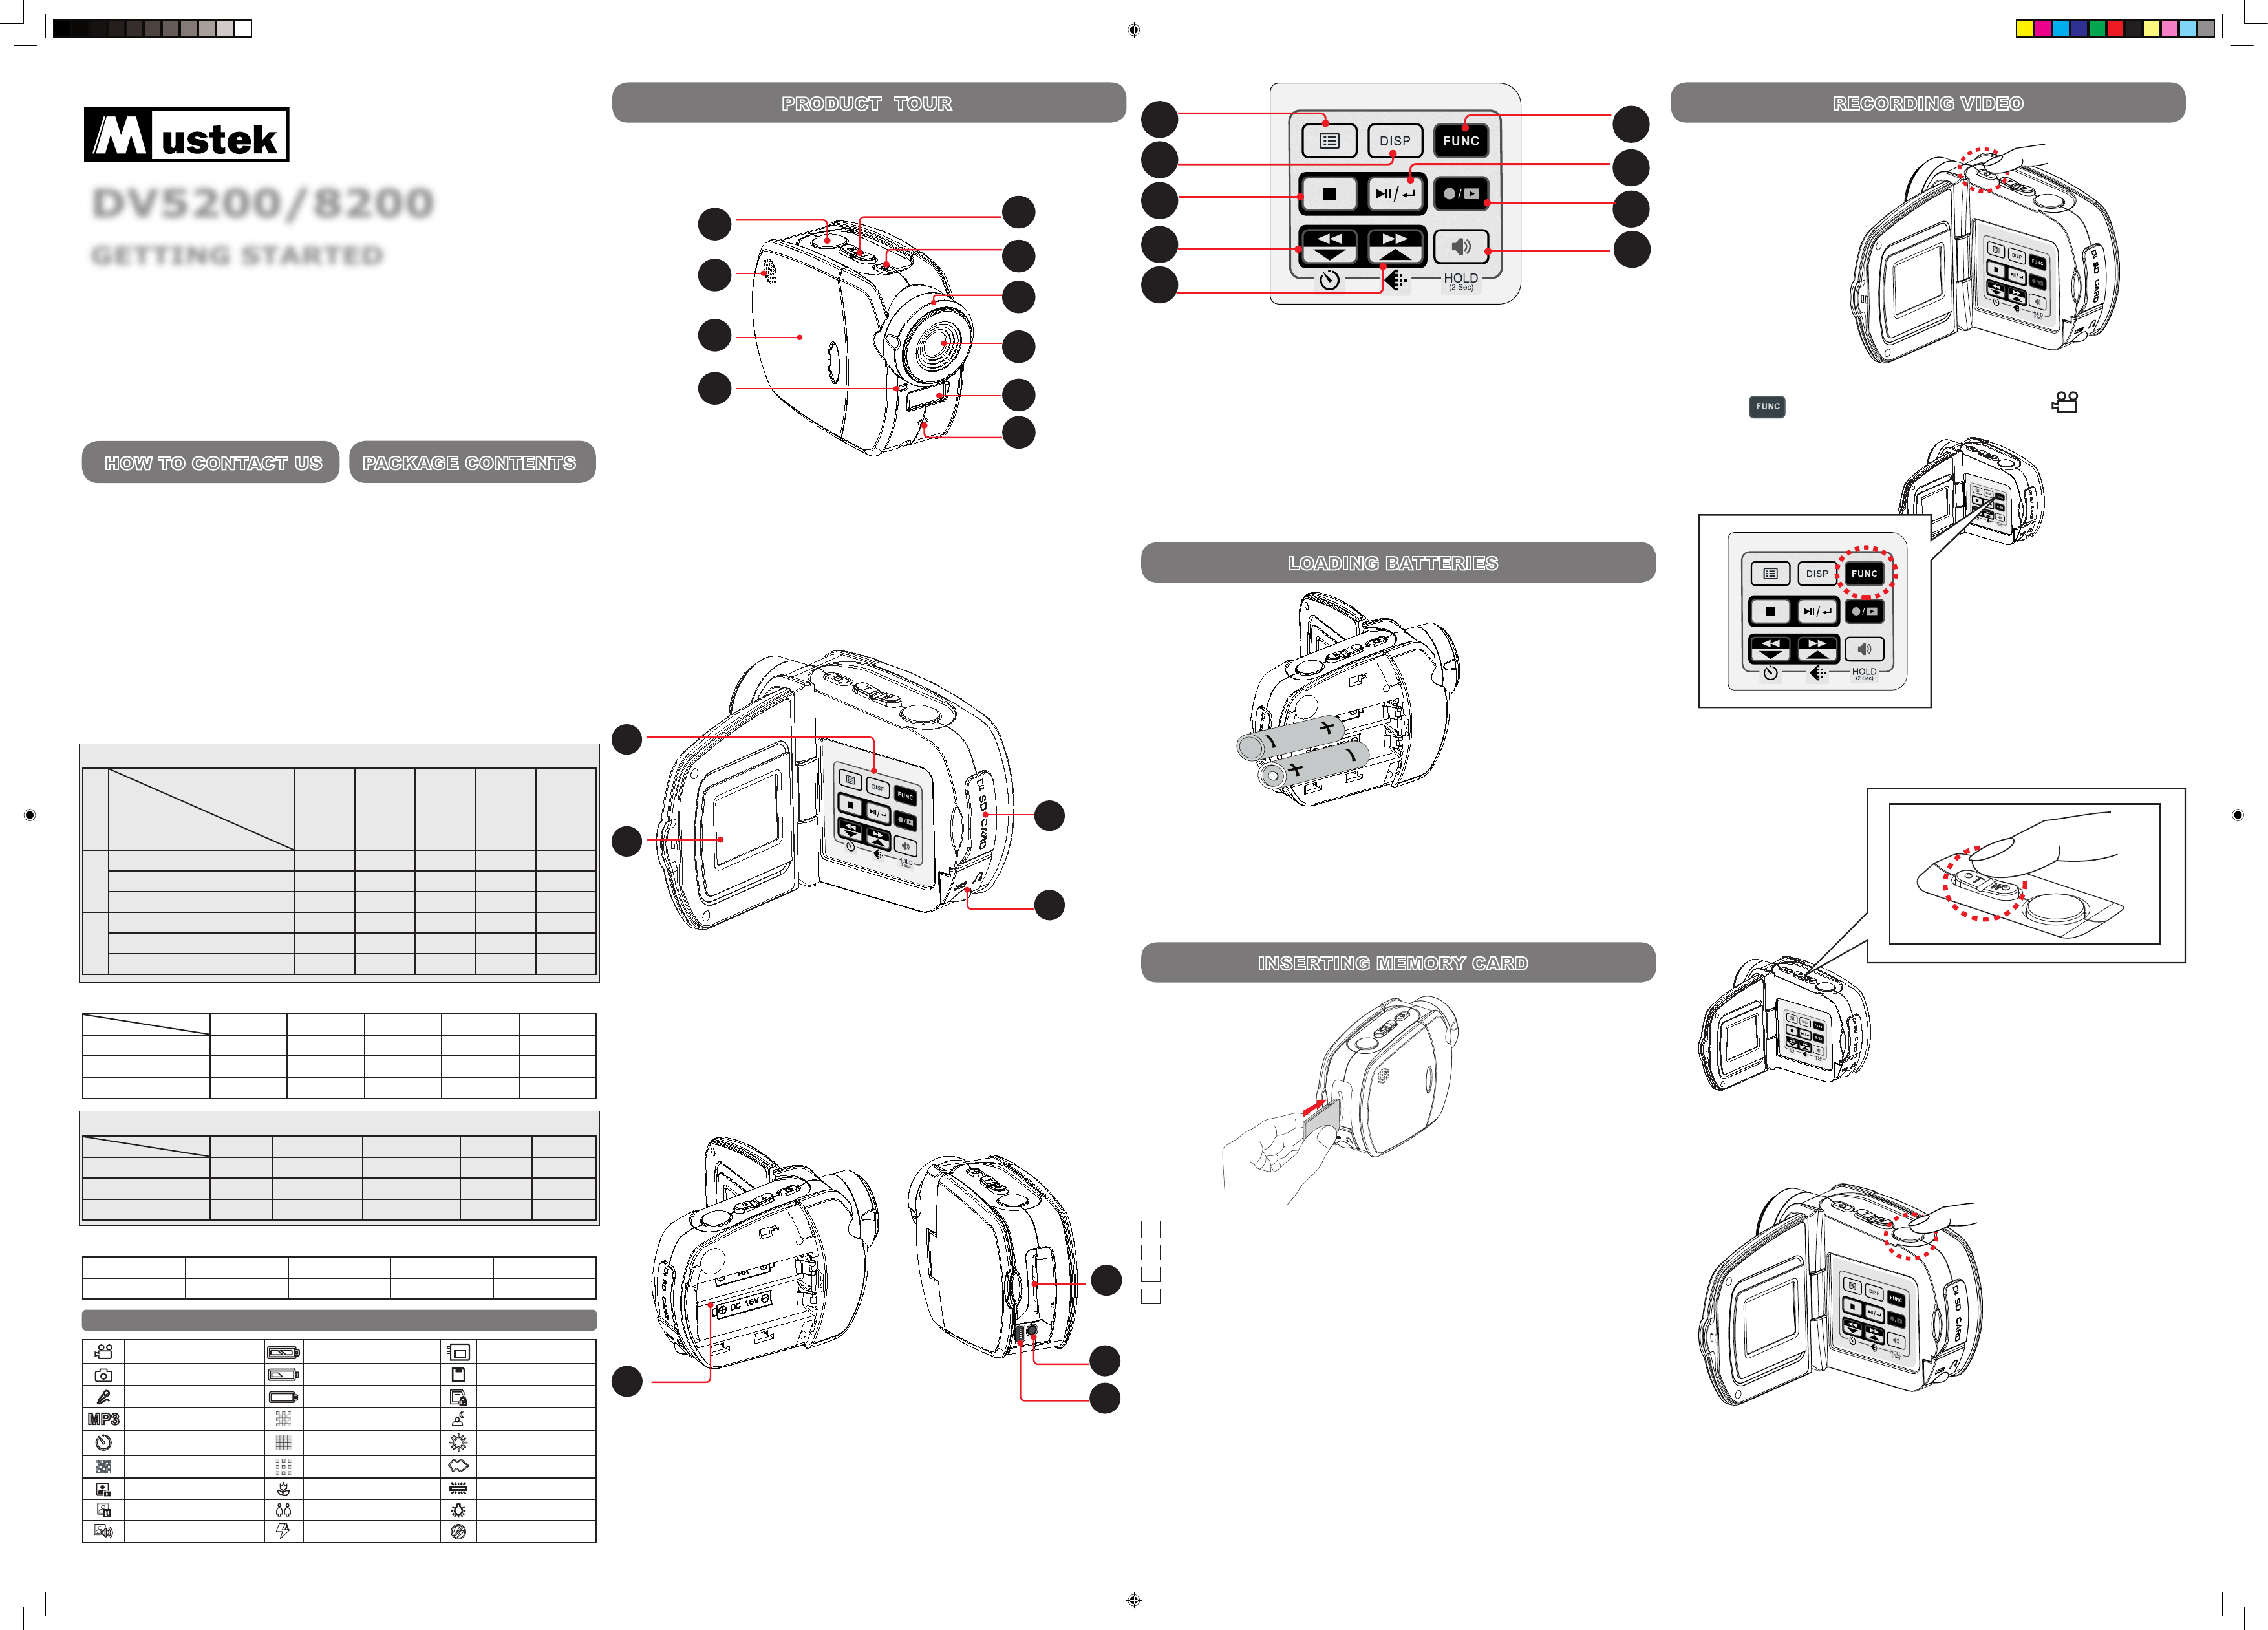 MUSTEK DV5200 WINDOWS 7 64BIT DRIVER DOWNLOAD